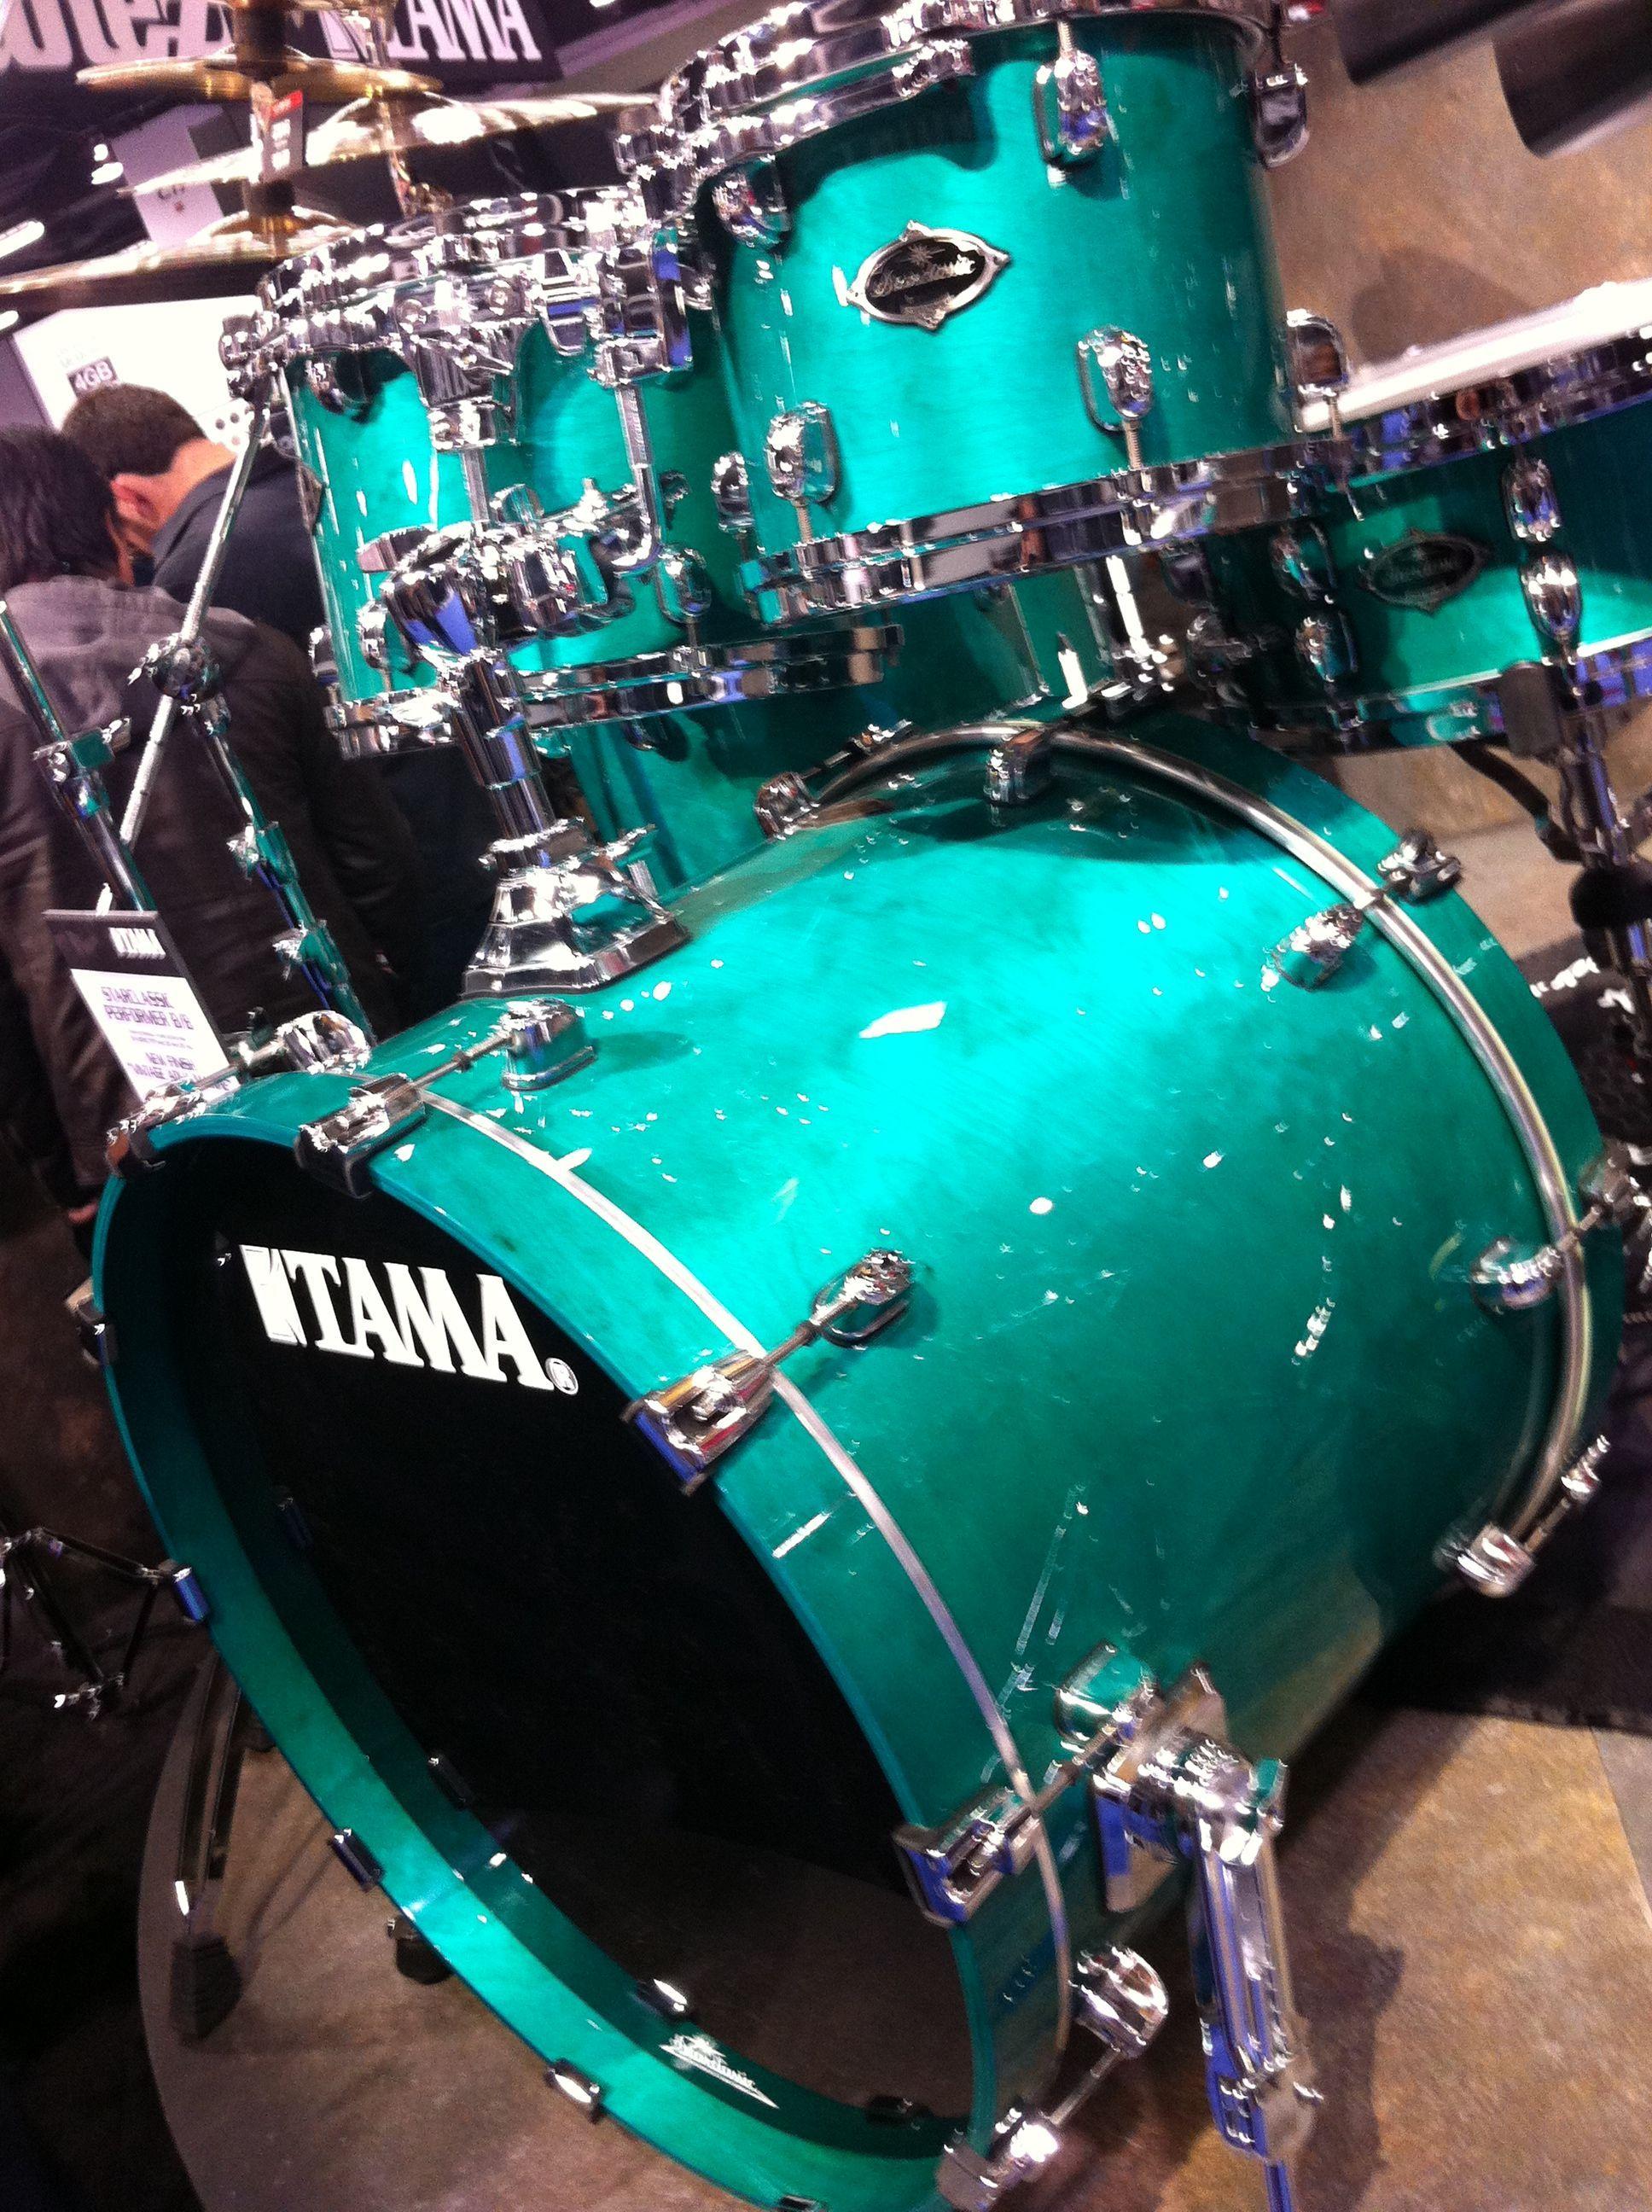 Beautiful drum set turquoise green blue tama drumkit